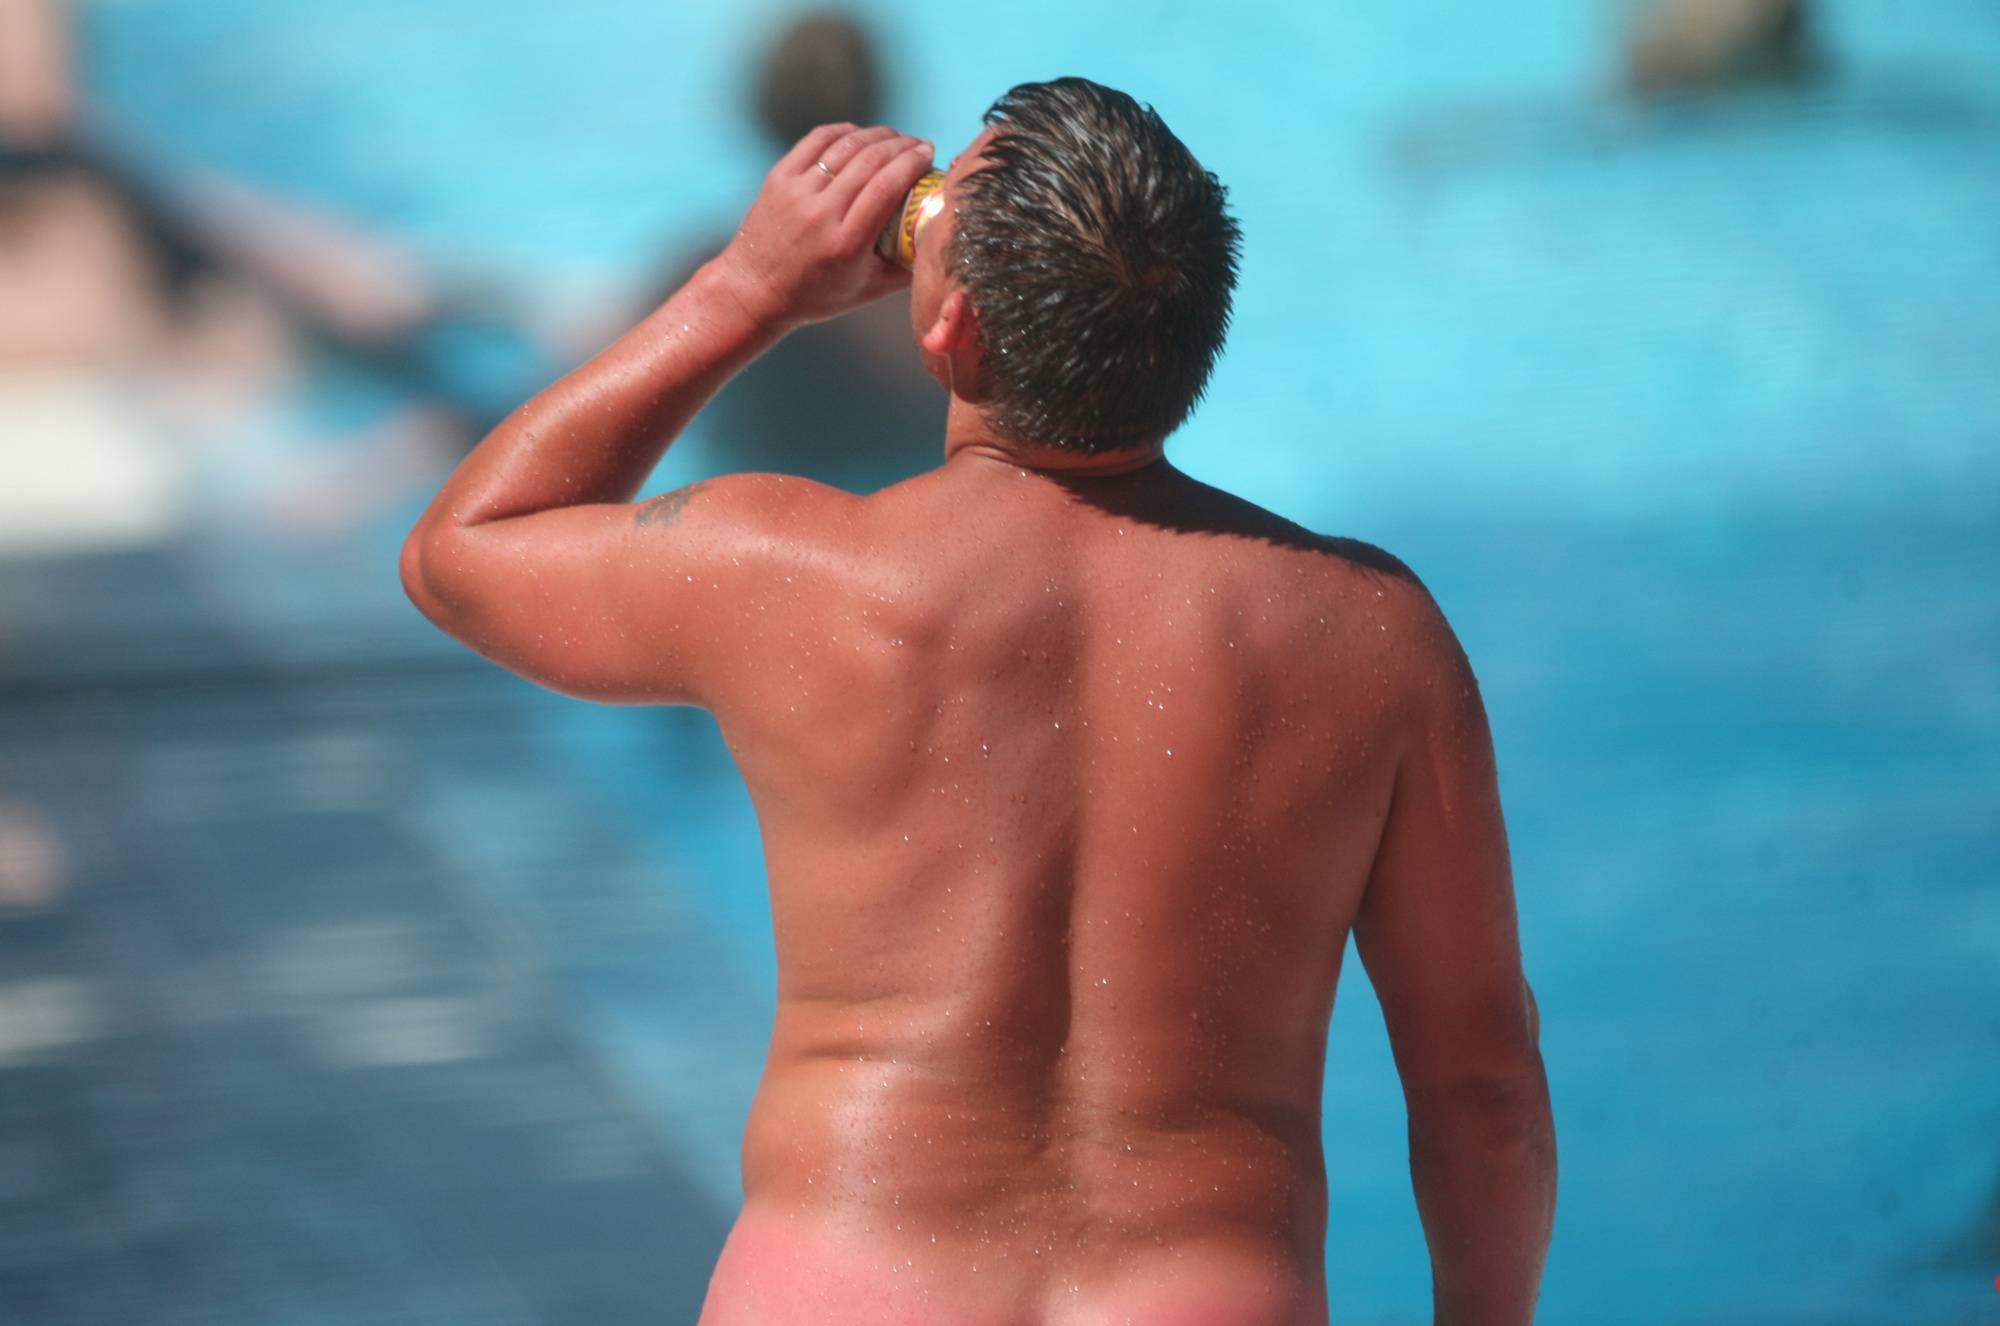 Pure Nudism Pics Nudist Pool Walk Around - 1